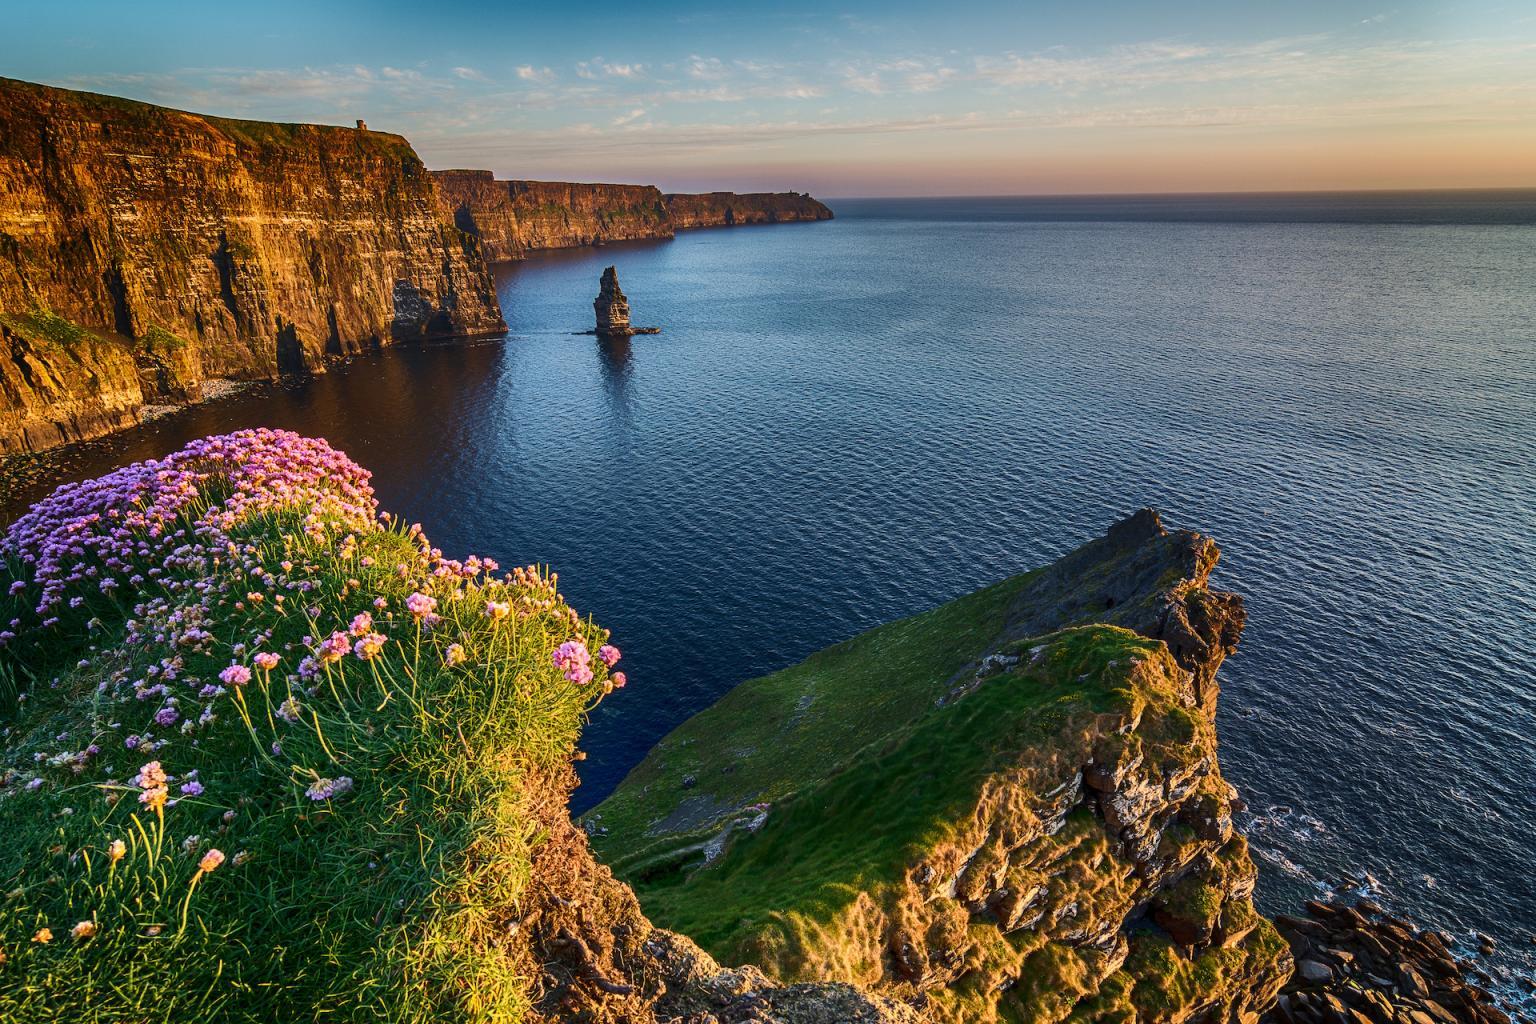 Recuni City Pictures Ireland_Cliffs